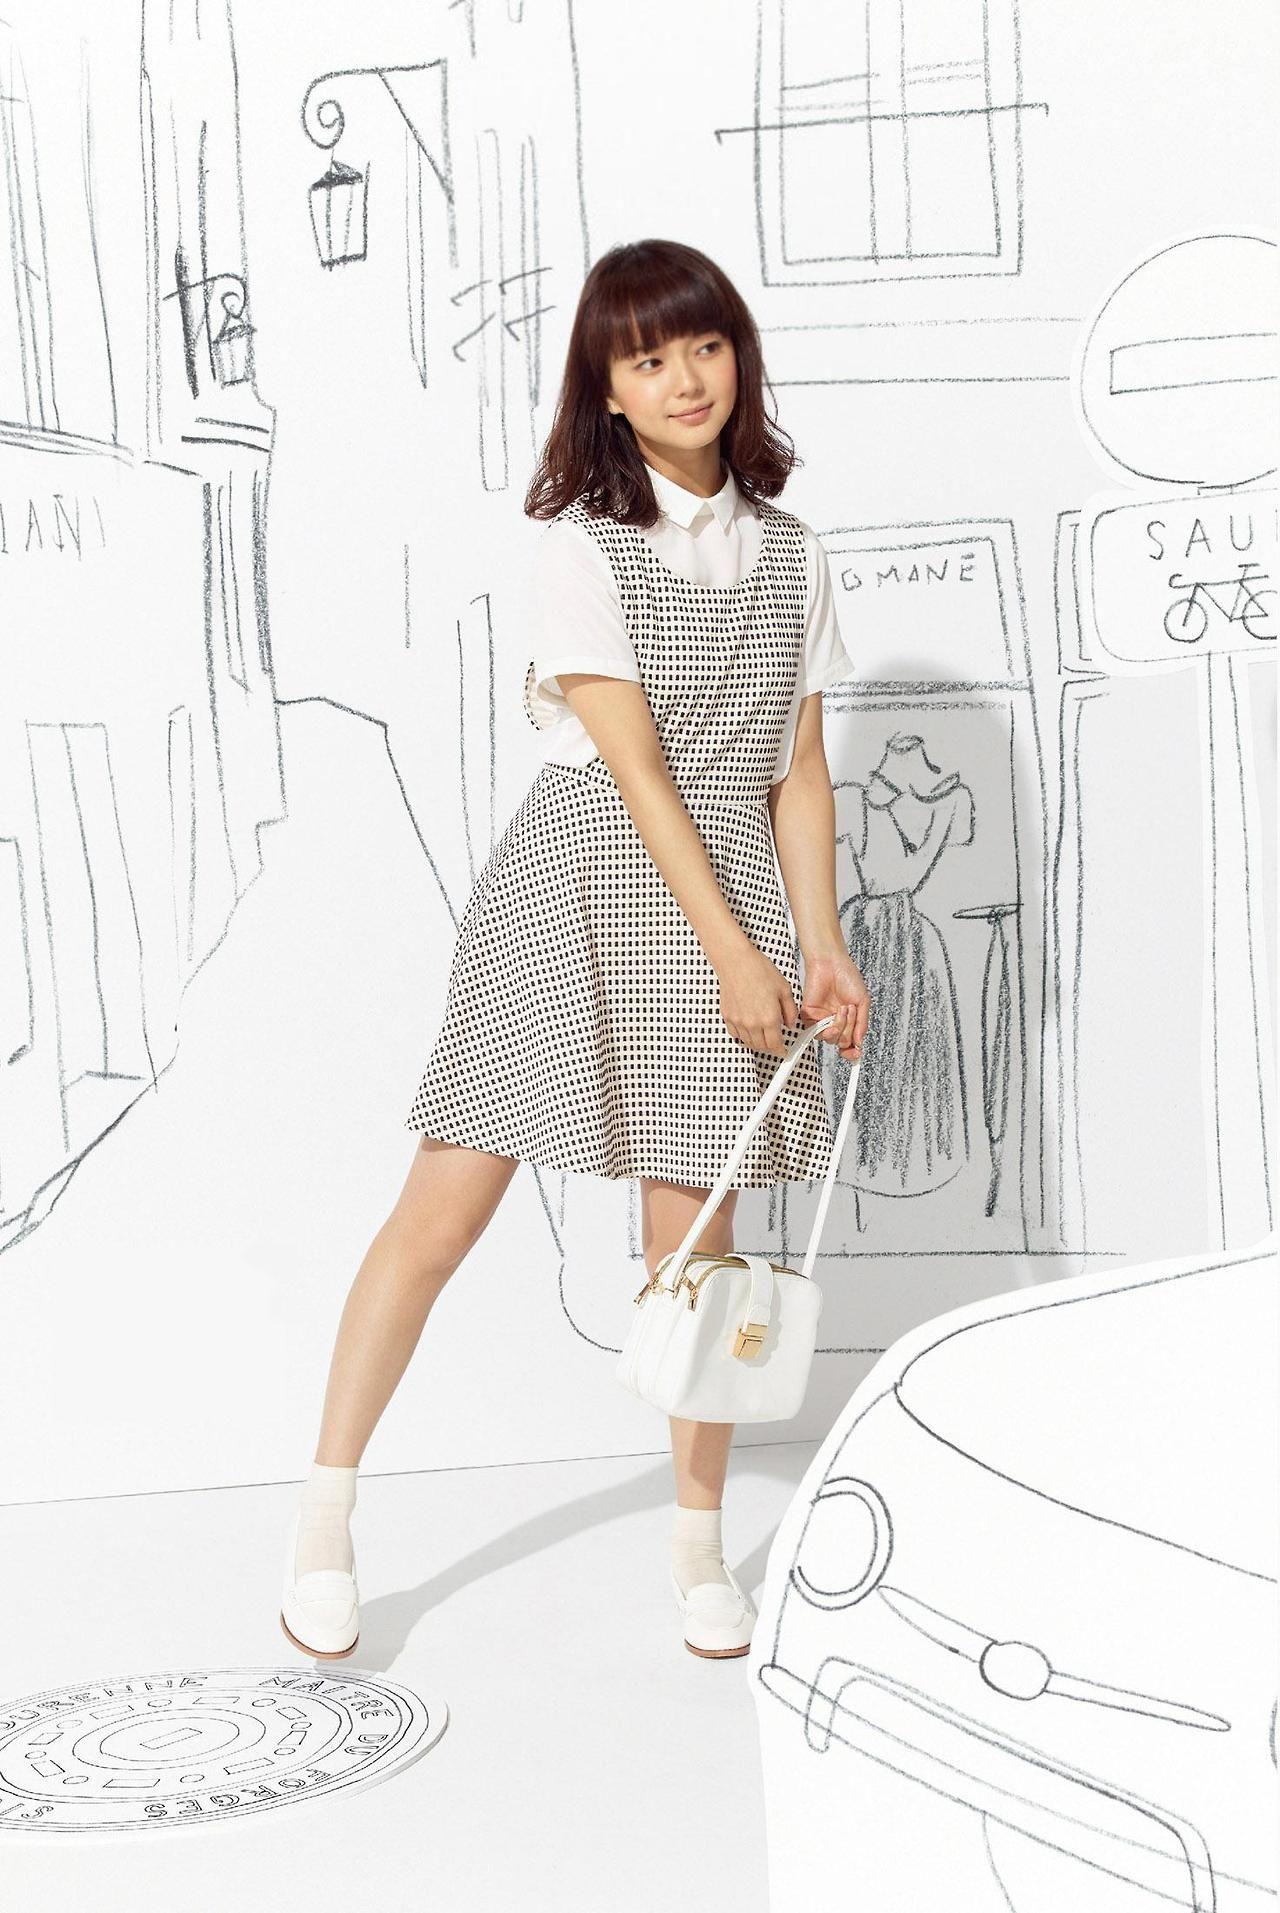 actress」おしゃれまとめの人気アイデア Pinterest aykaaa   アジアンファッション, 素敵な少女, ファッション